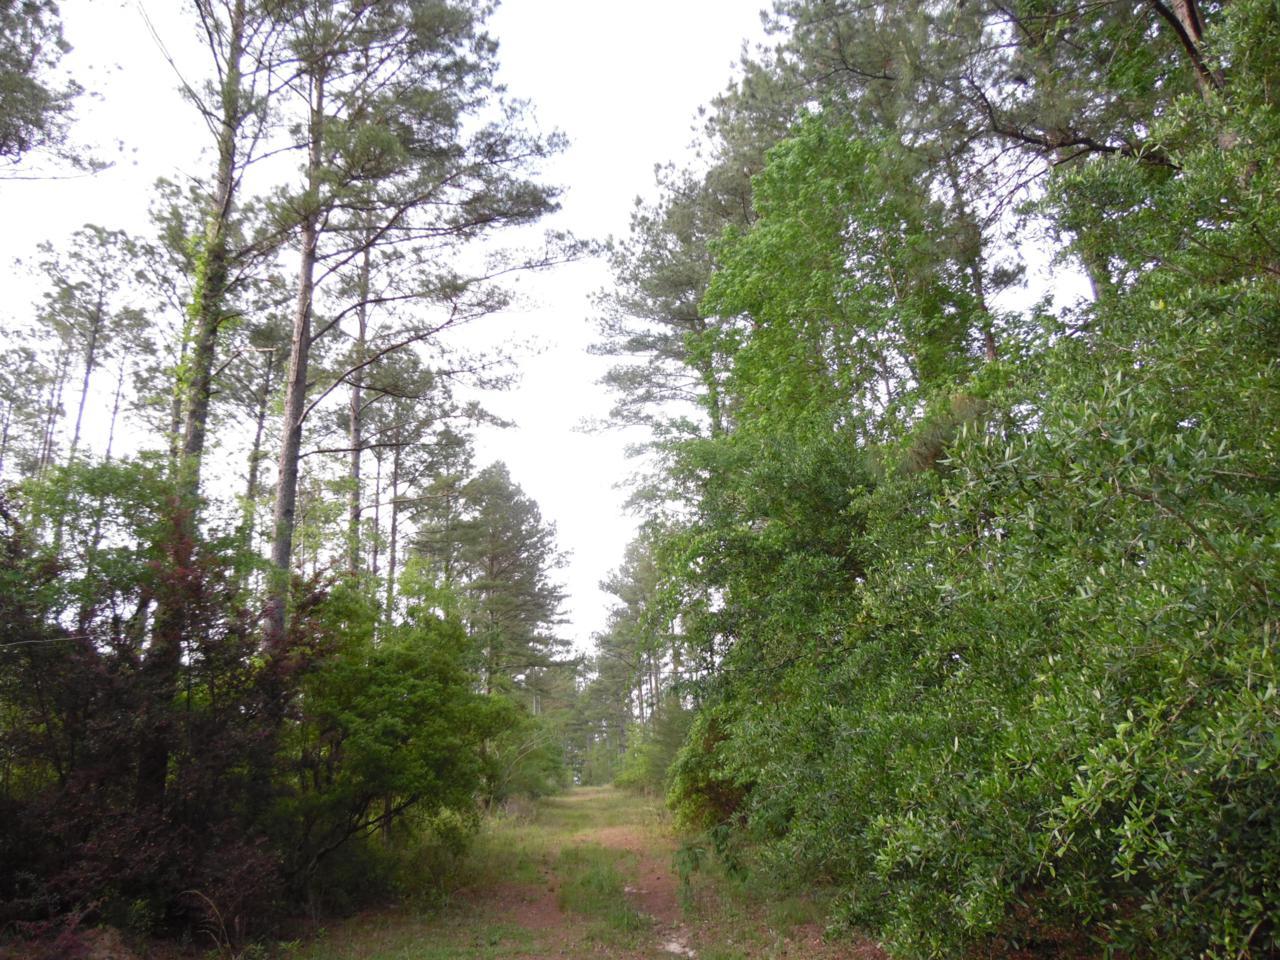 44 acres 4714 Co. Hwy 89 - Photo 1